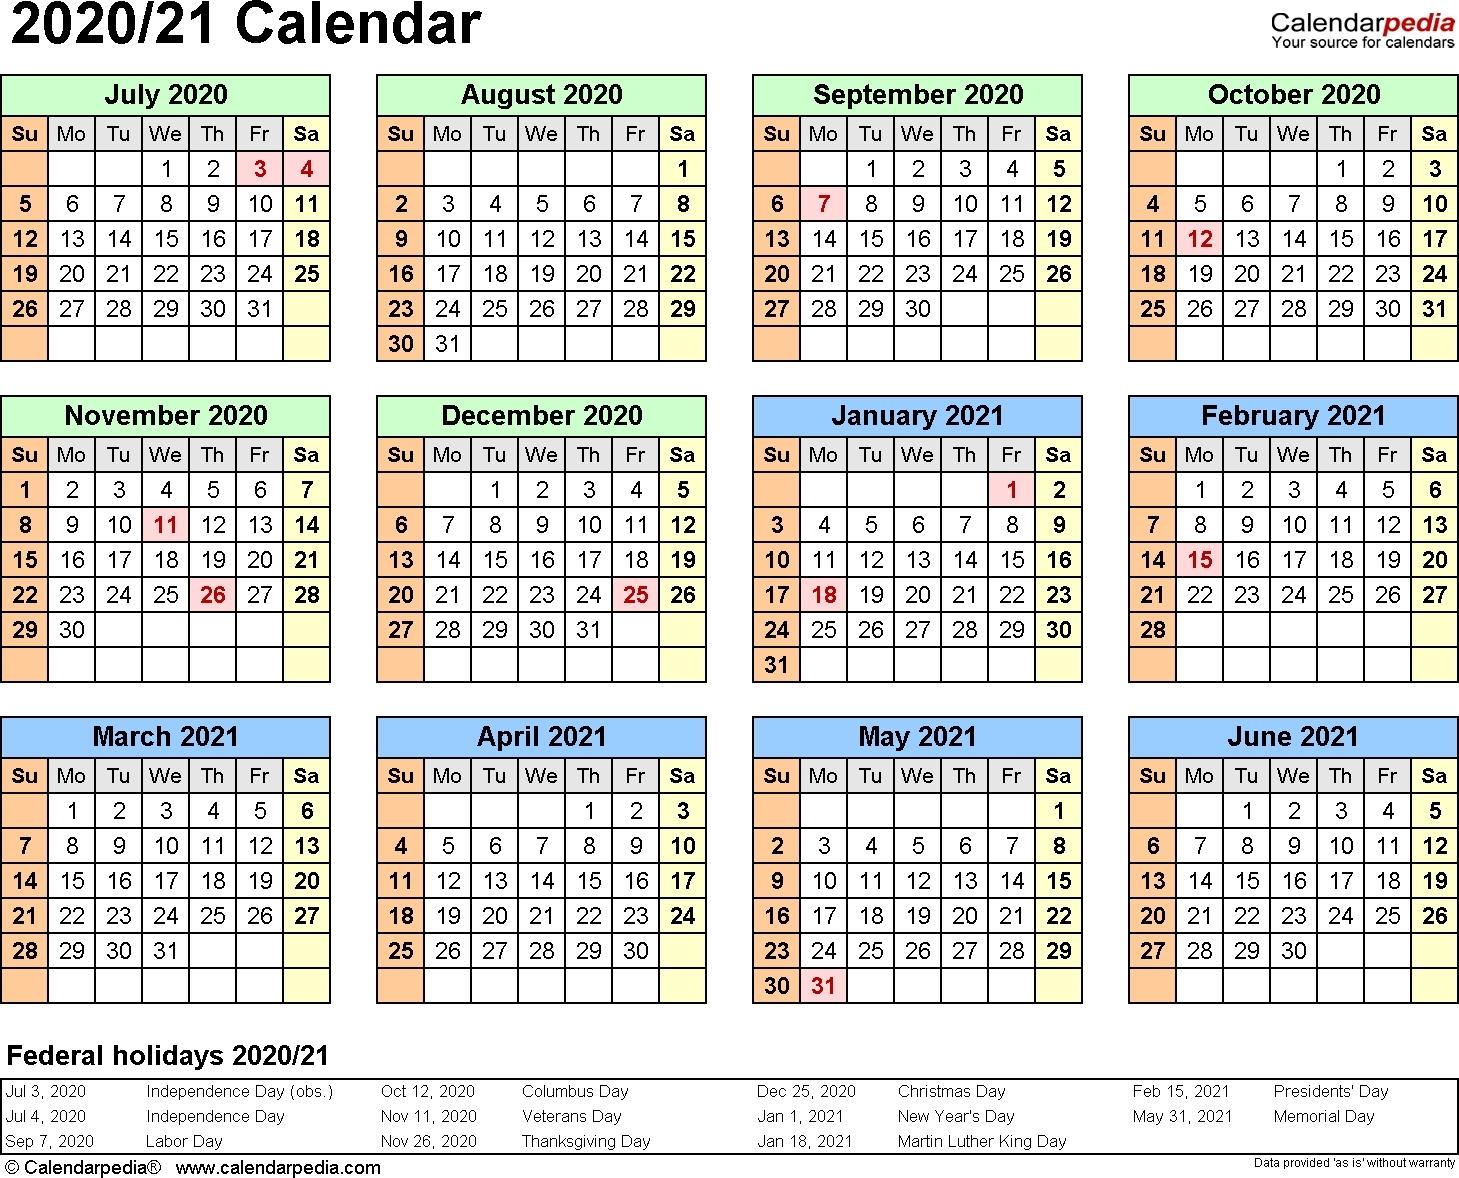 Calendarpedia 2020 Excel | Calendar For Planning  Australian 2020 Financial Year Calendar